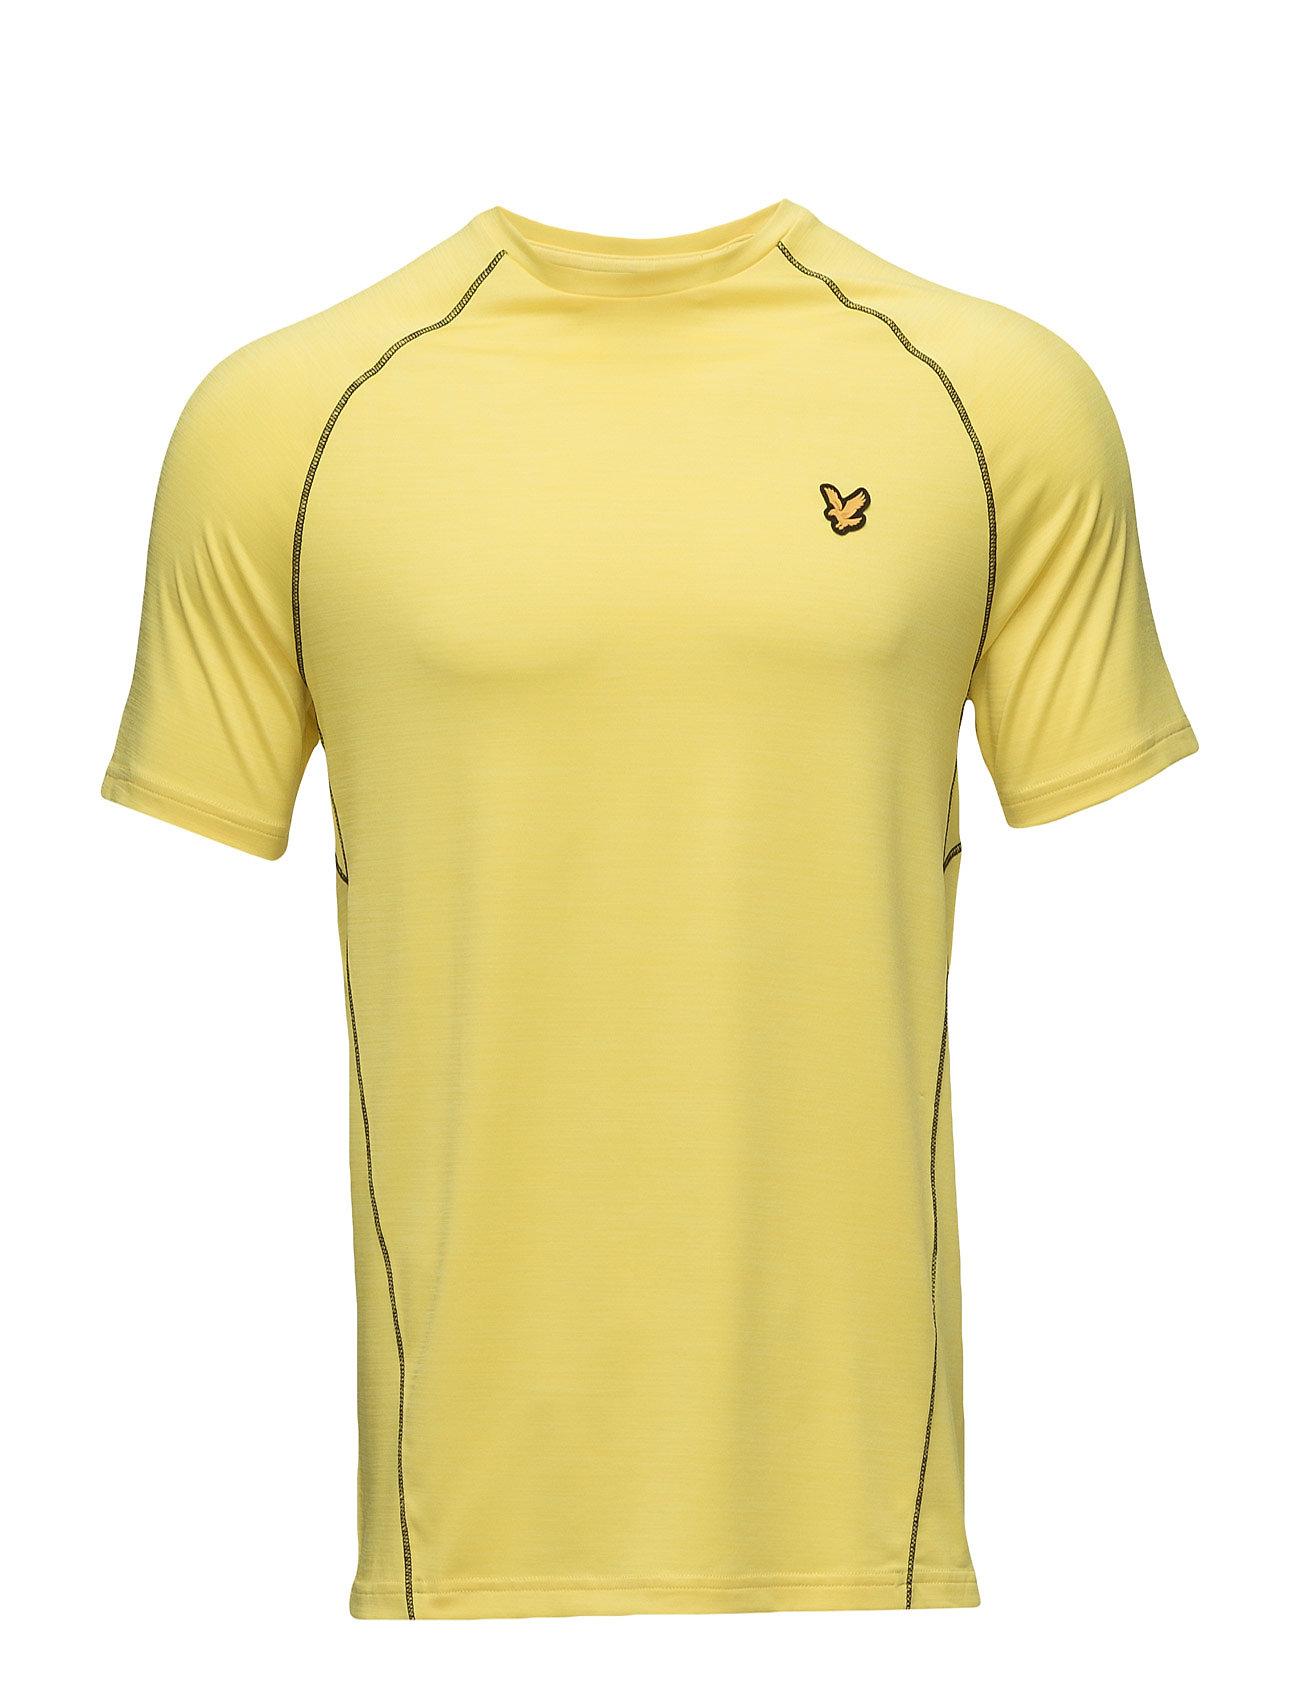 Image of Jones Training T-Shirt (2628470101)